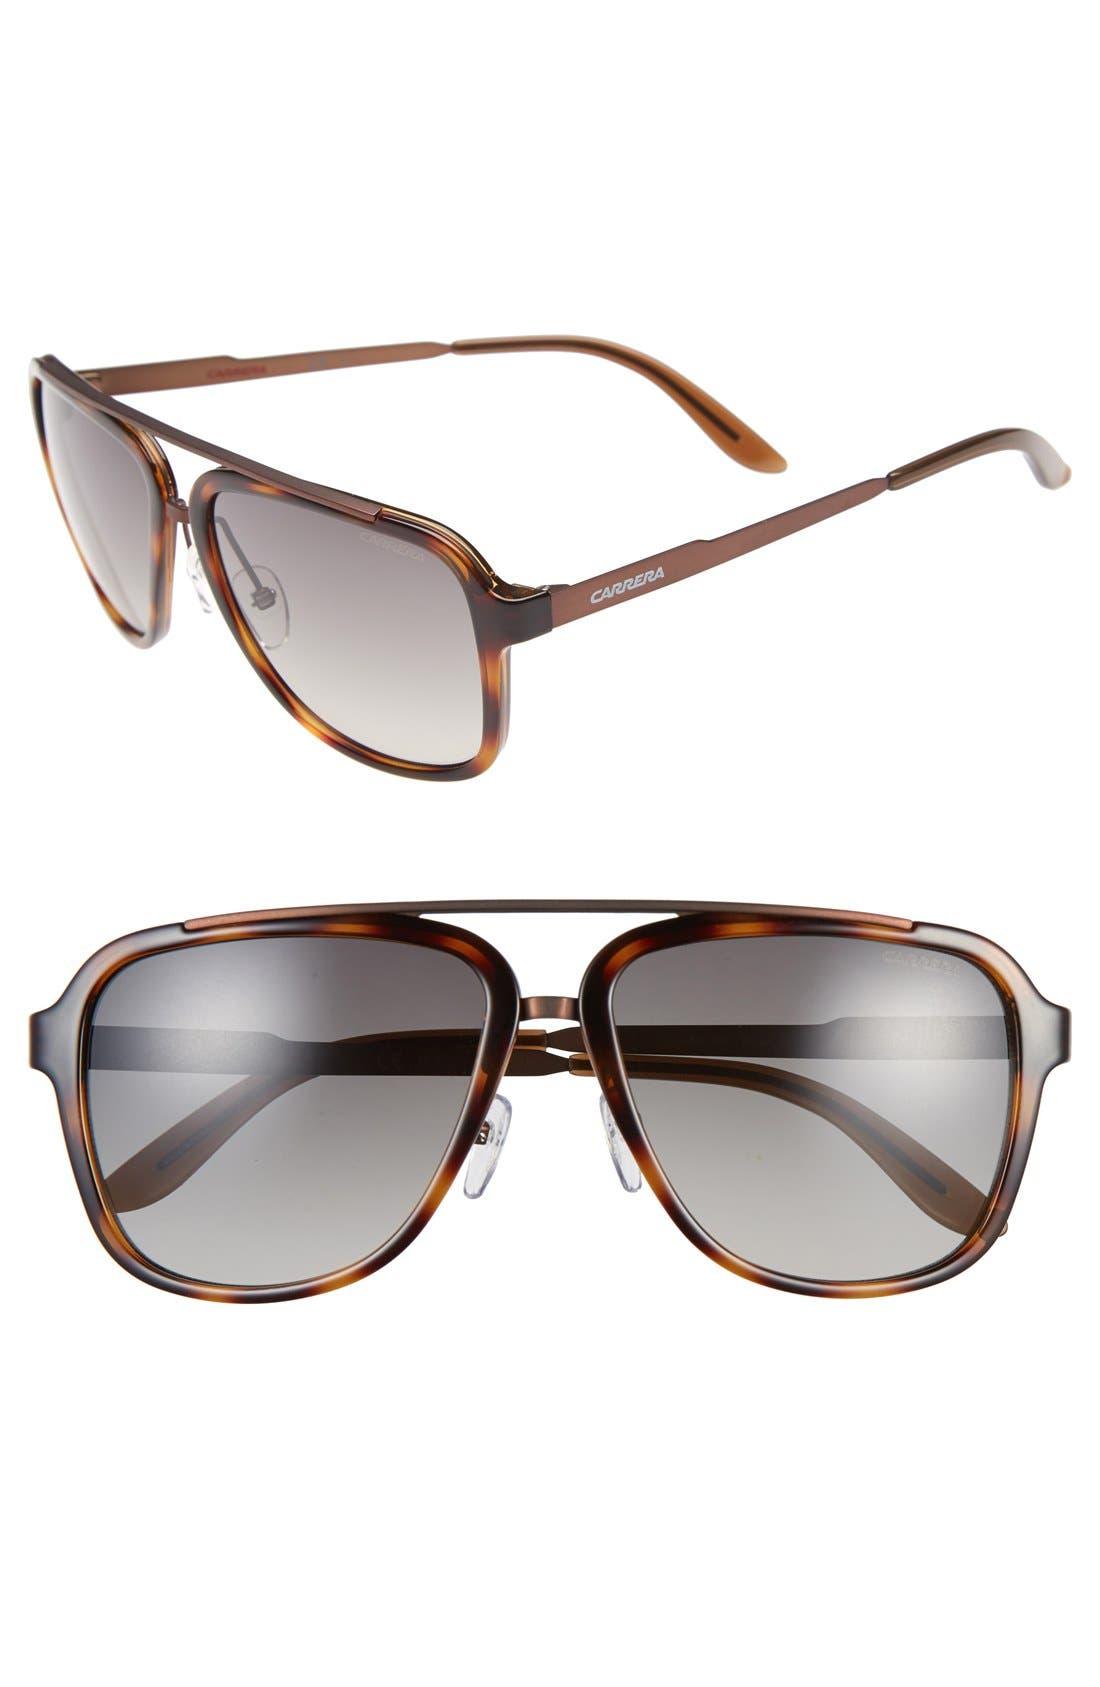 57mm Navigator Sunglasses,                         Main,                         color, HAVANA BROWN BROWN GRADIENT